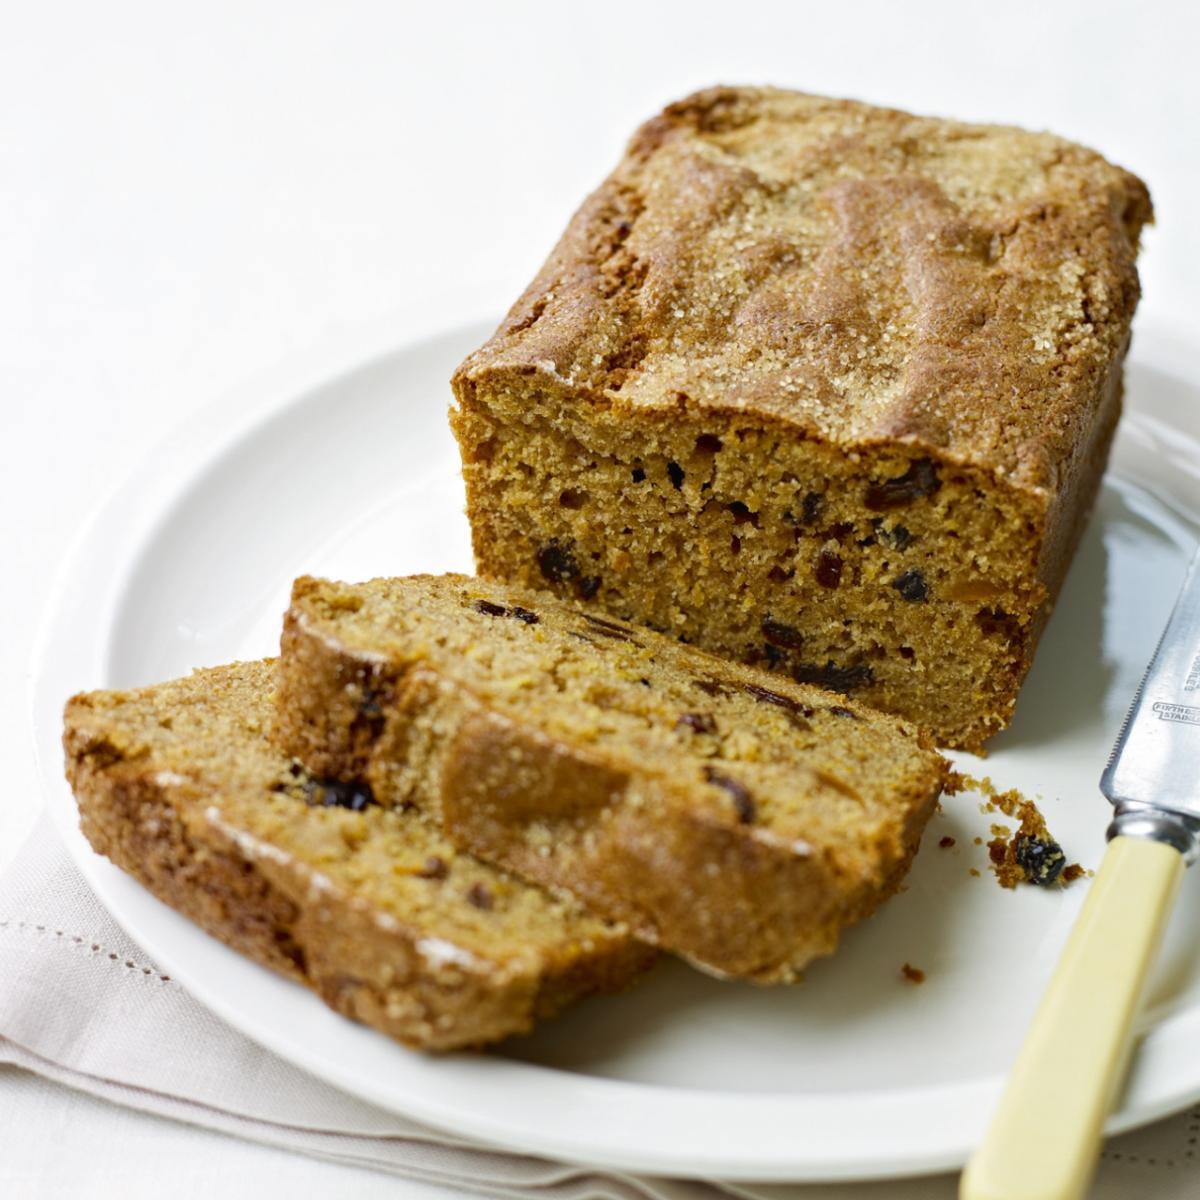 Cakes marmalade cake